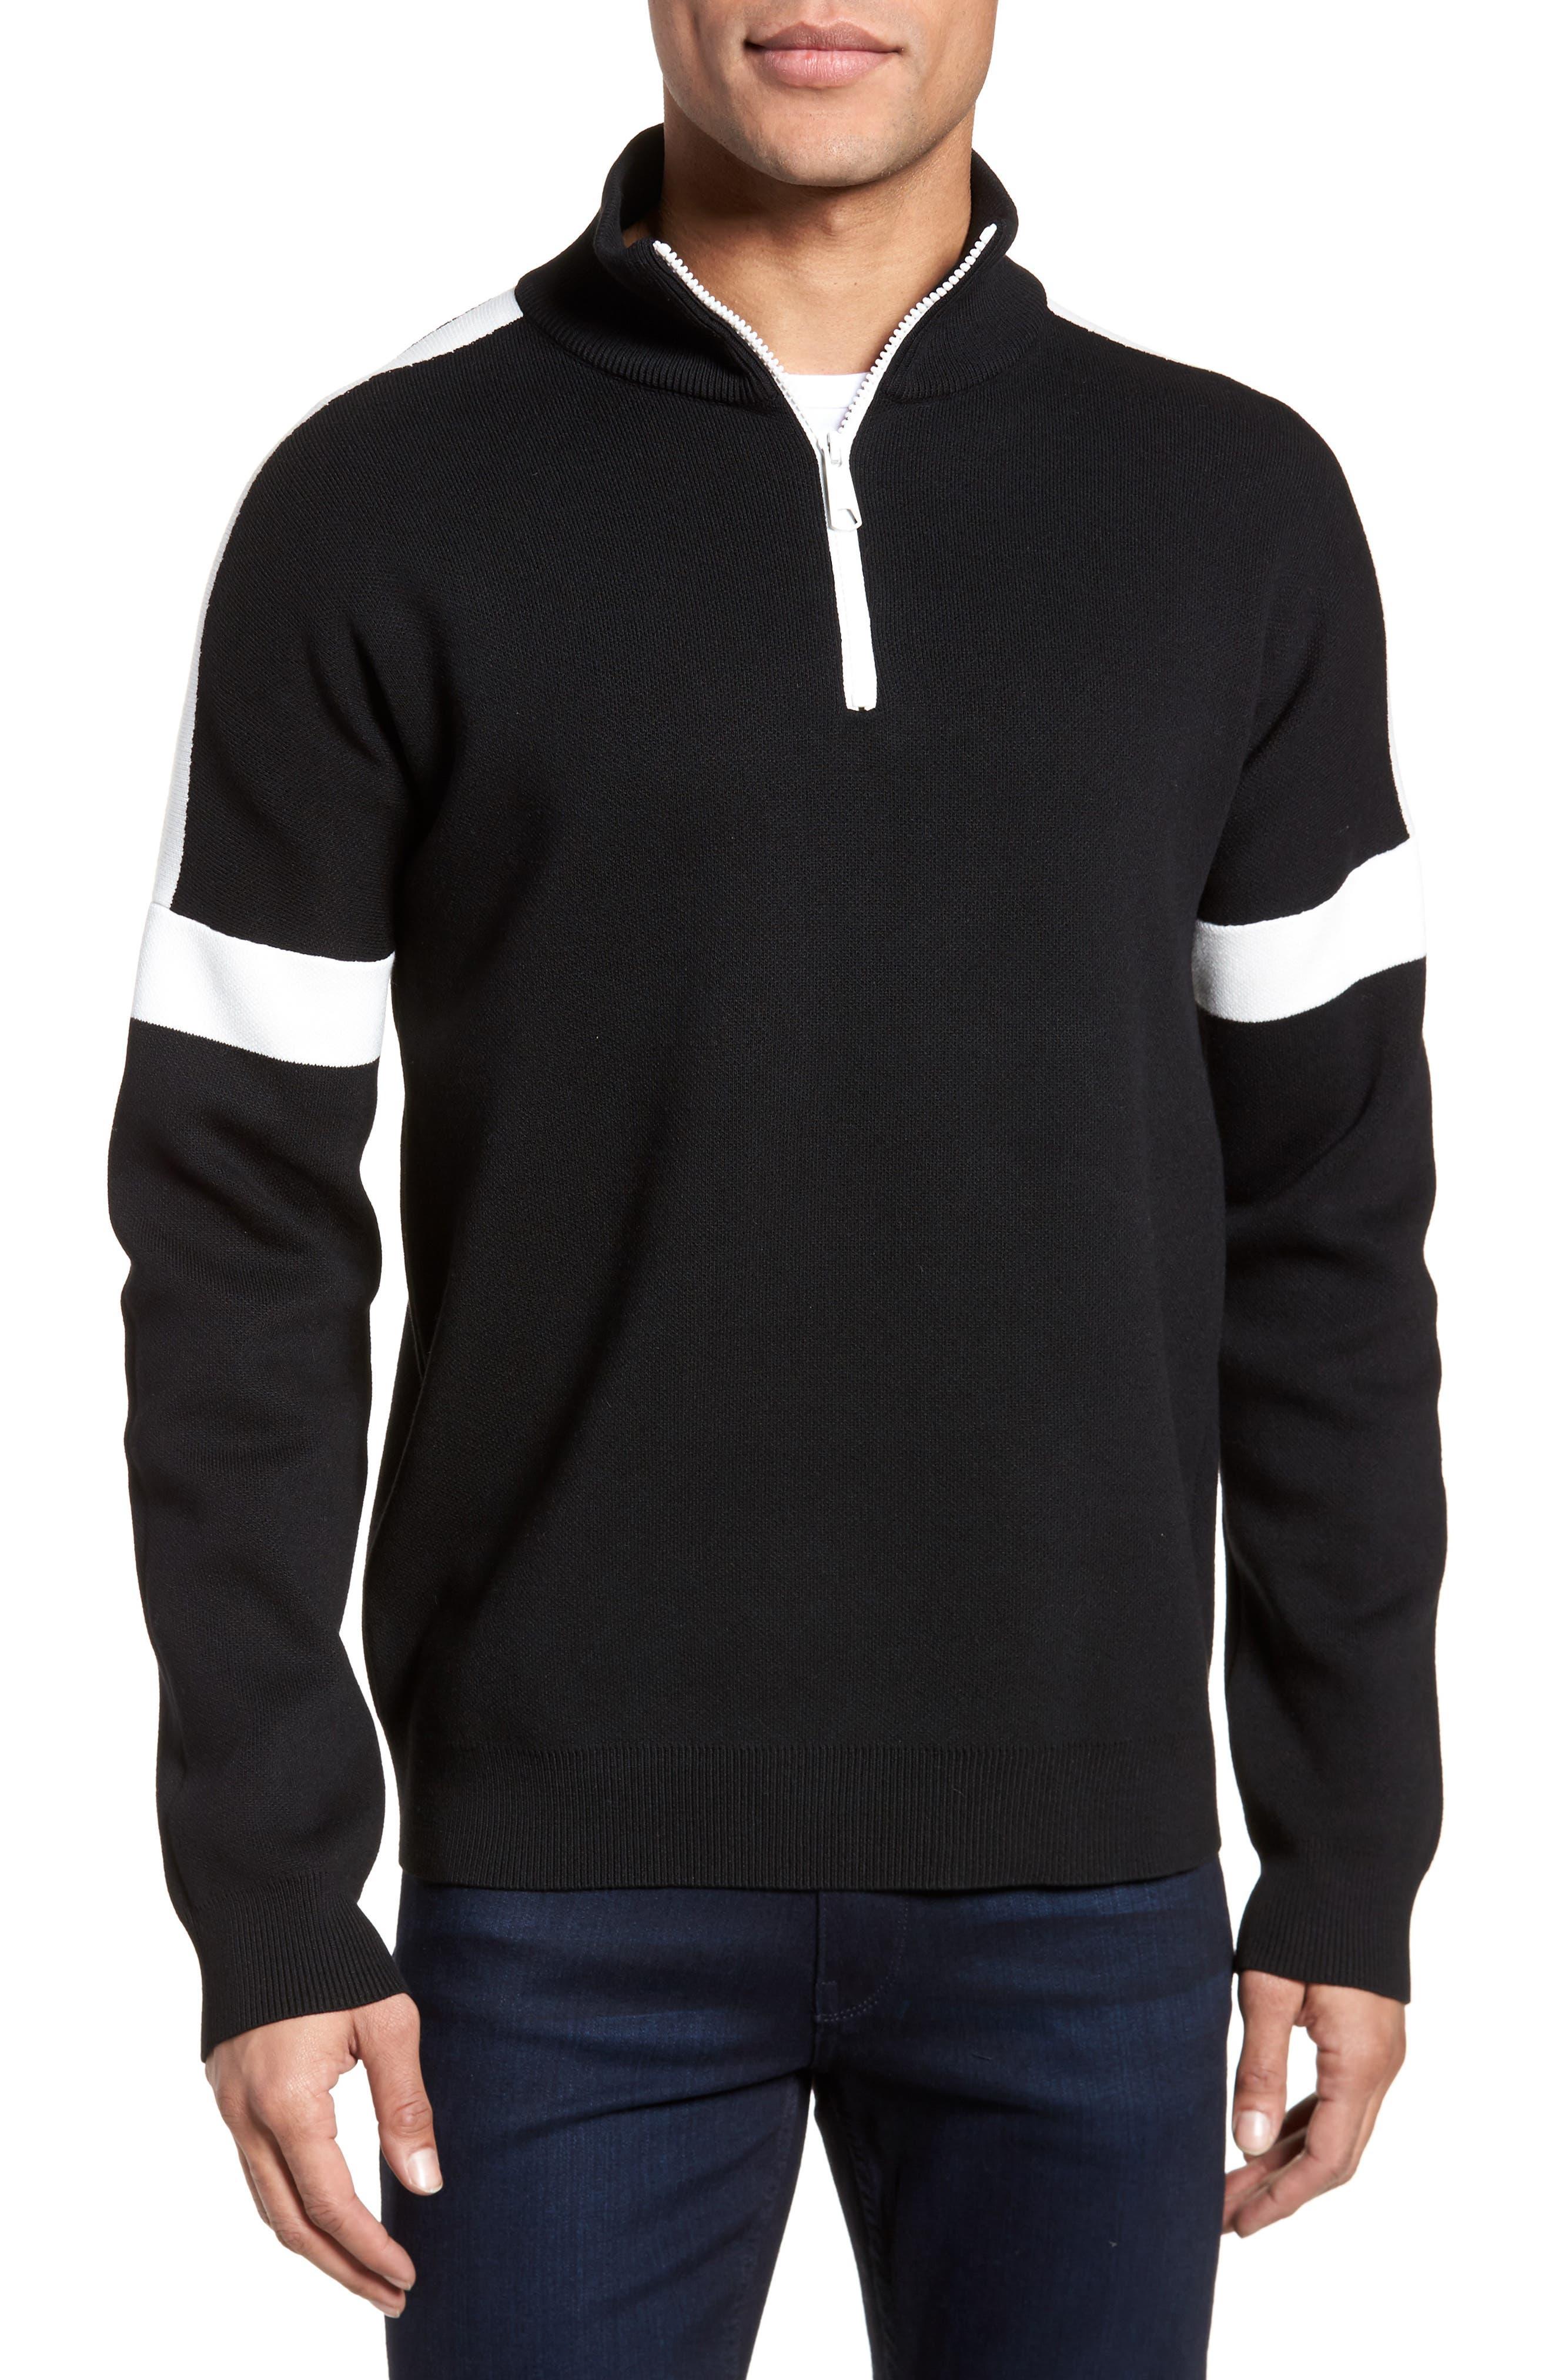 Lakra Regular Fit Half Zip Pullover,                             Main thumbnail 1, color,                             Black/Milk/Black